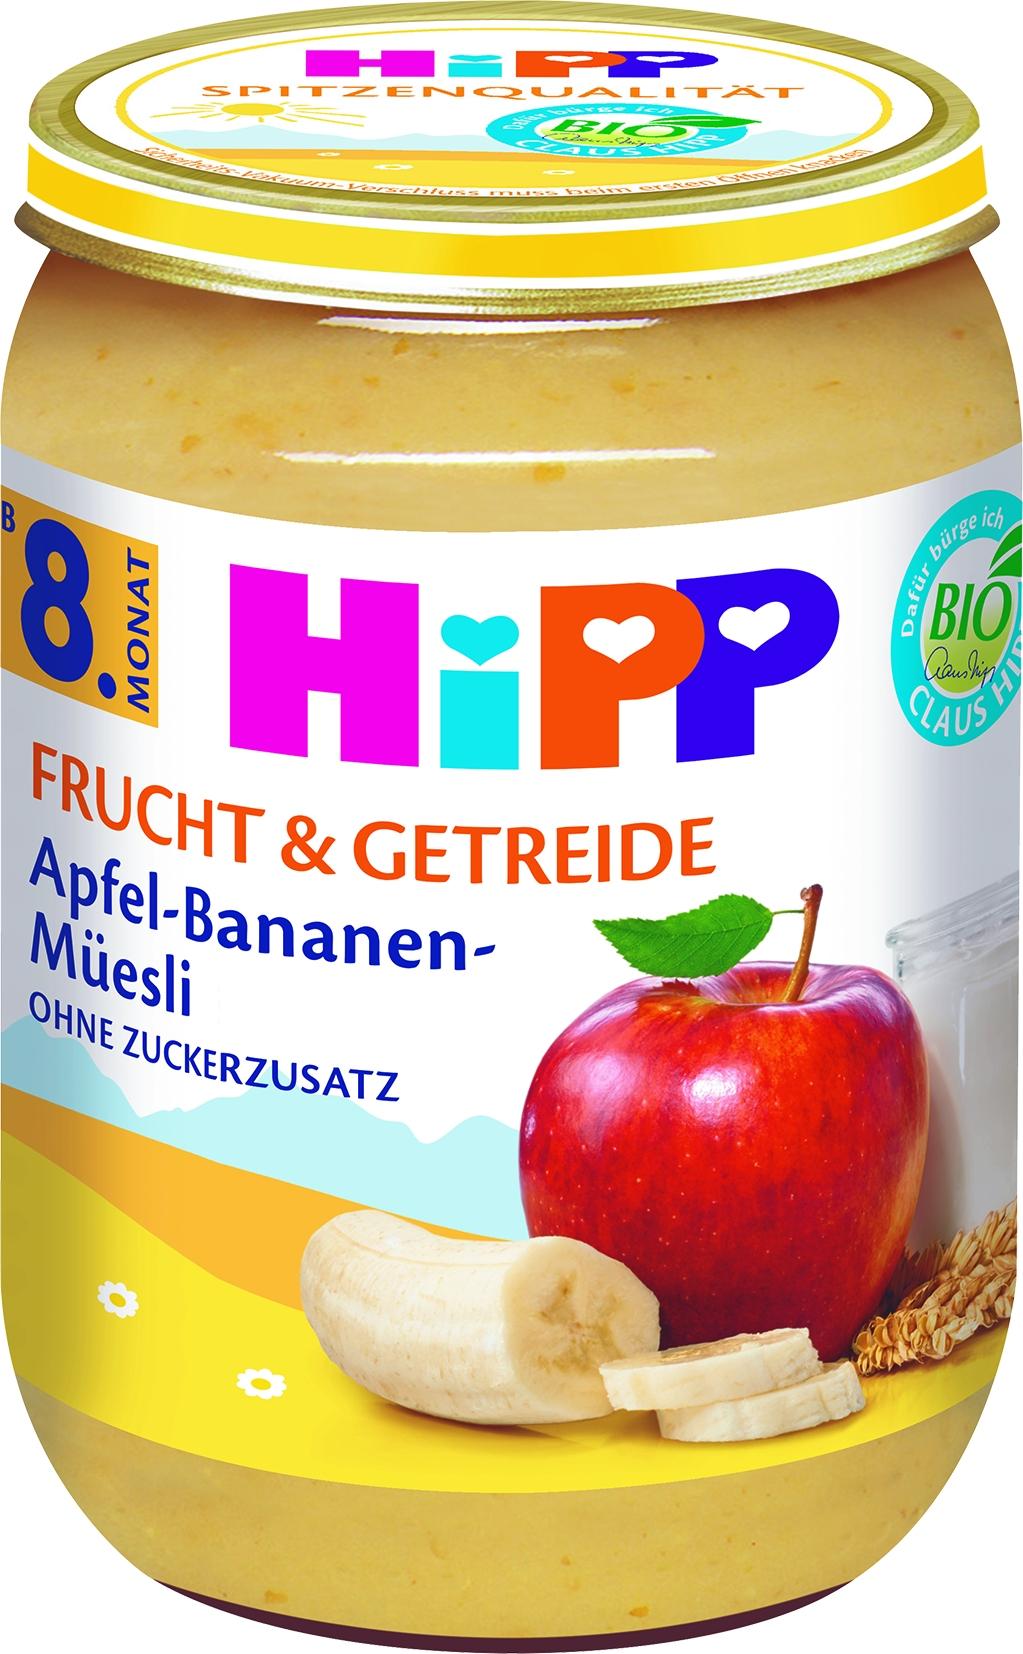 Bio 4860-01 F&G Apfel-Bananen-Muesli